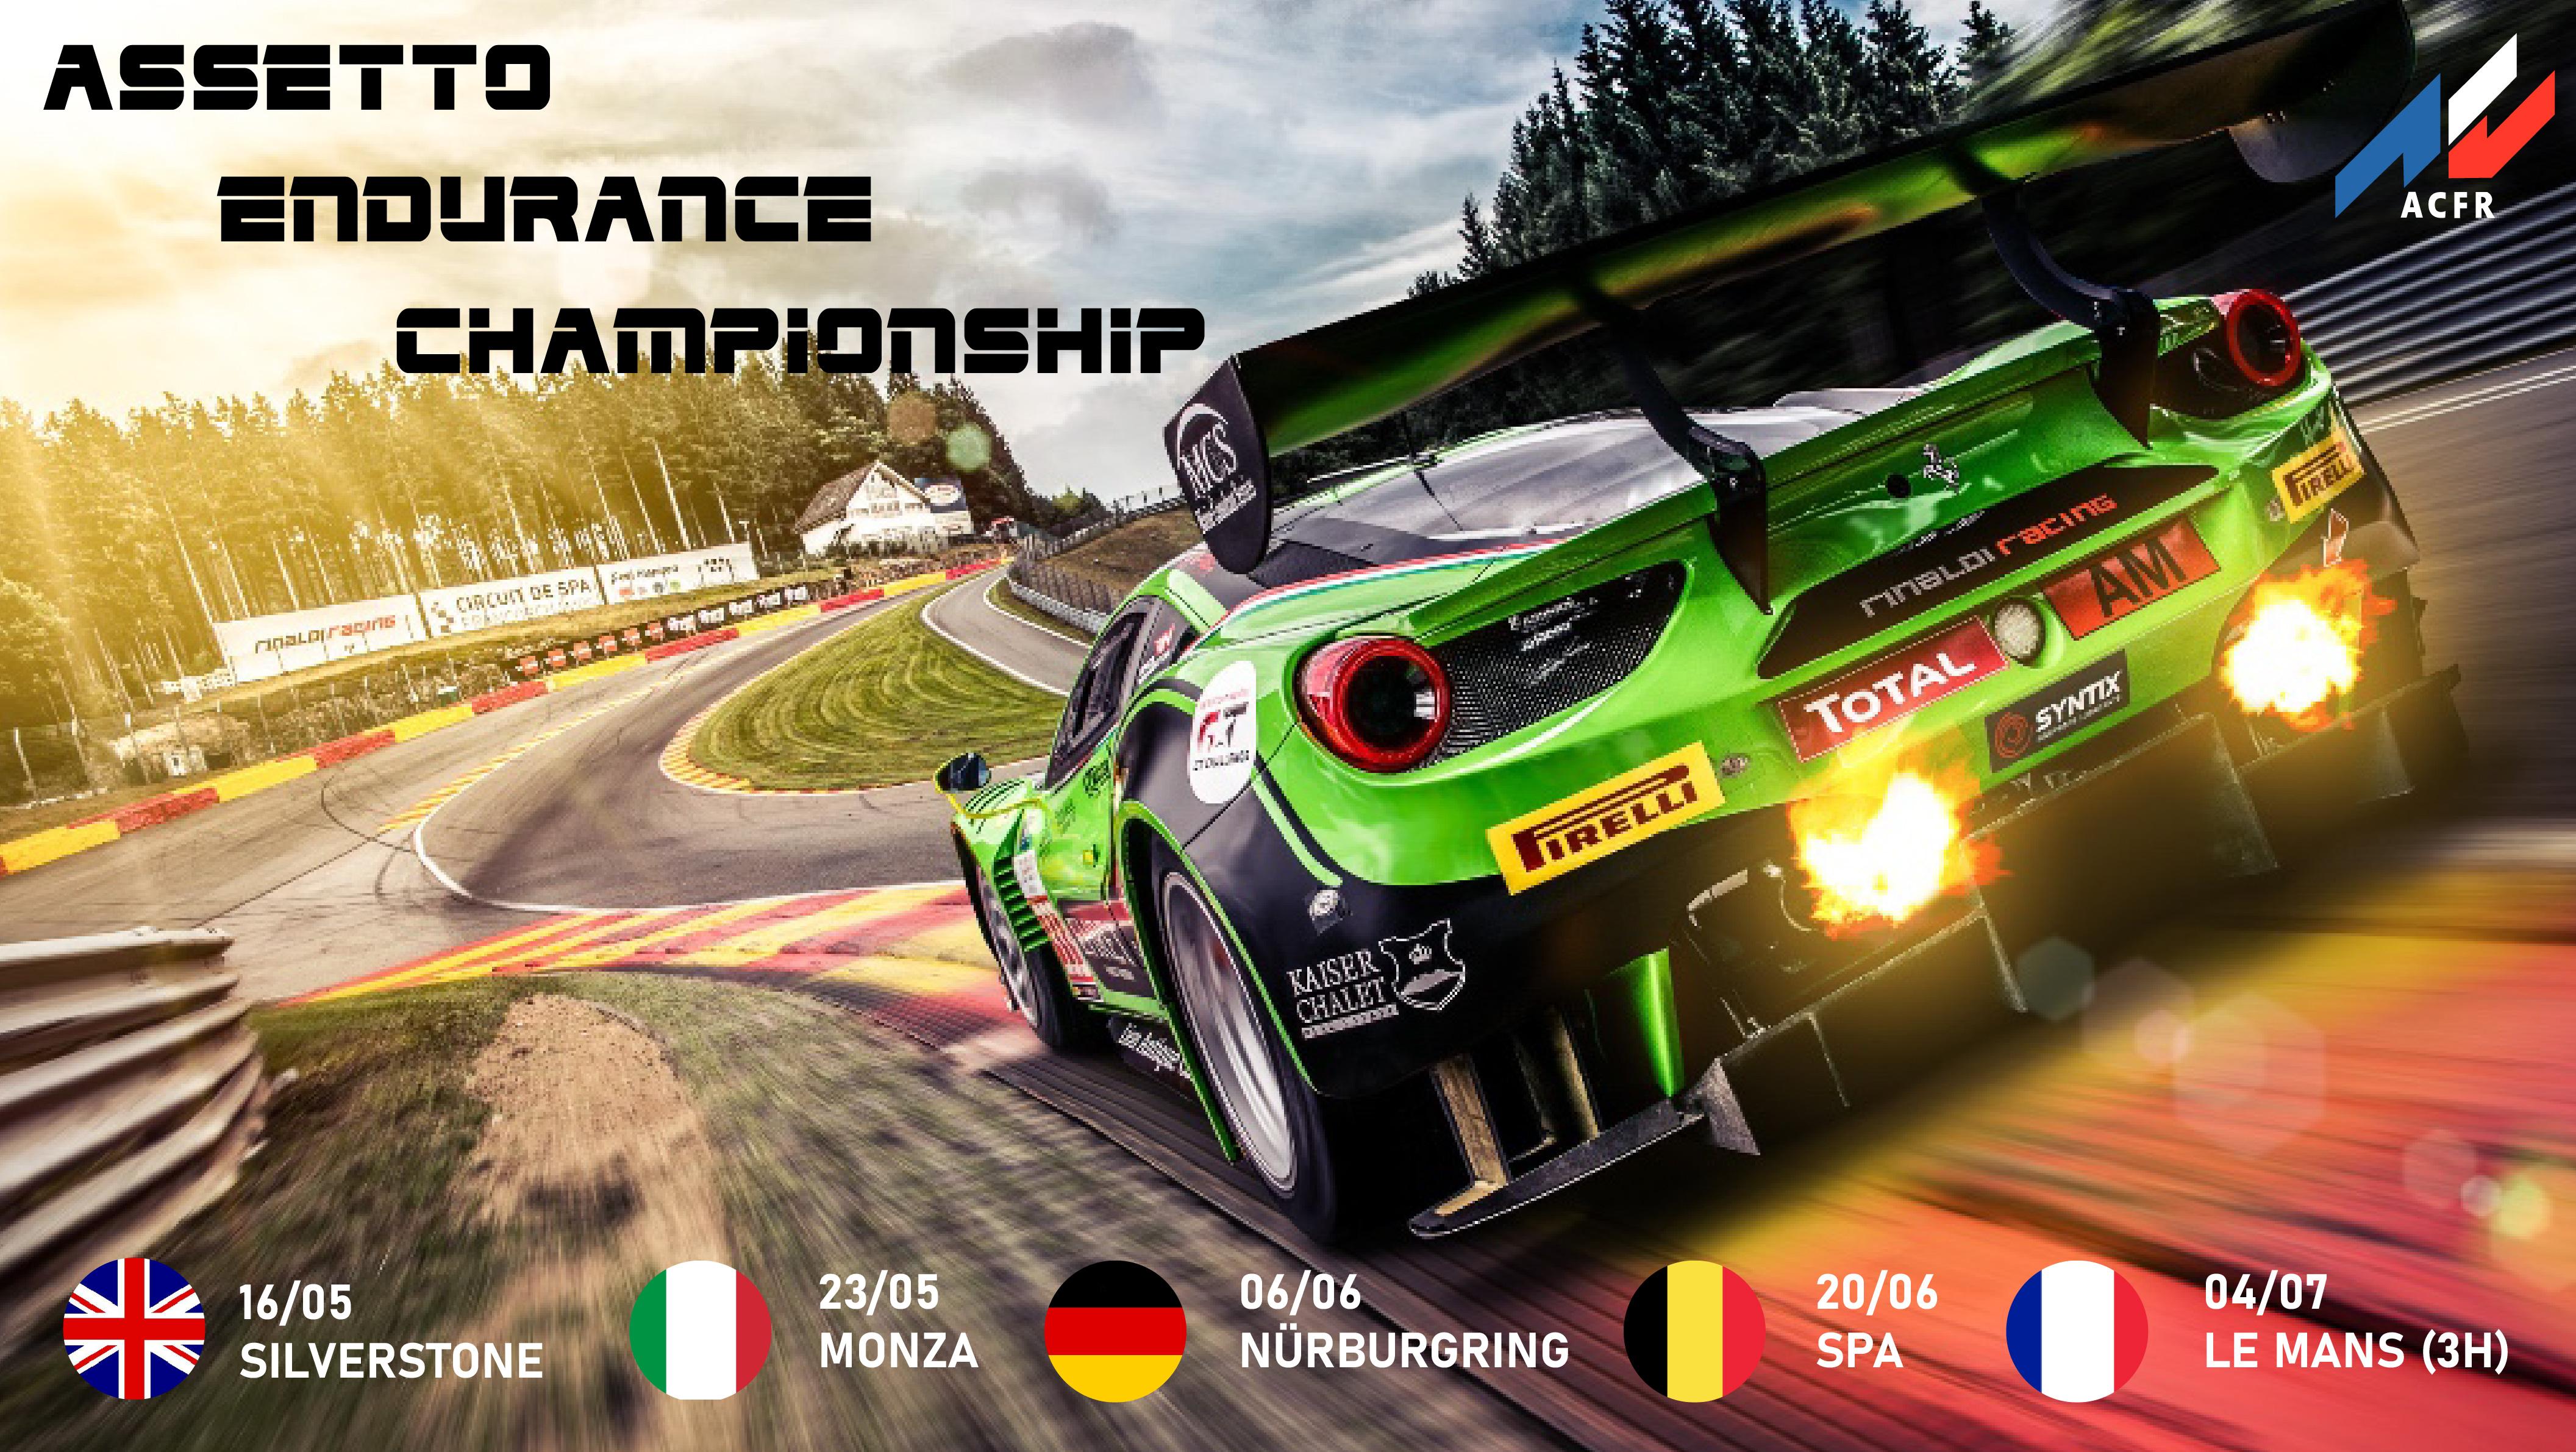 [AEC]Assetto Endurance Championship Champ24x-80